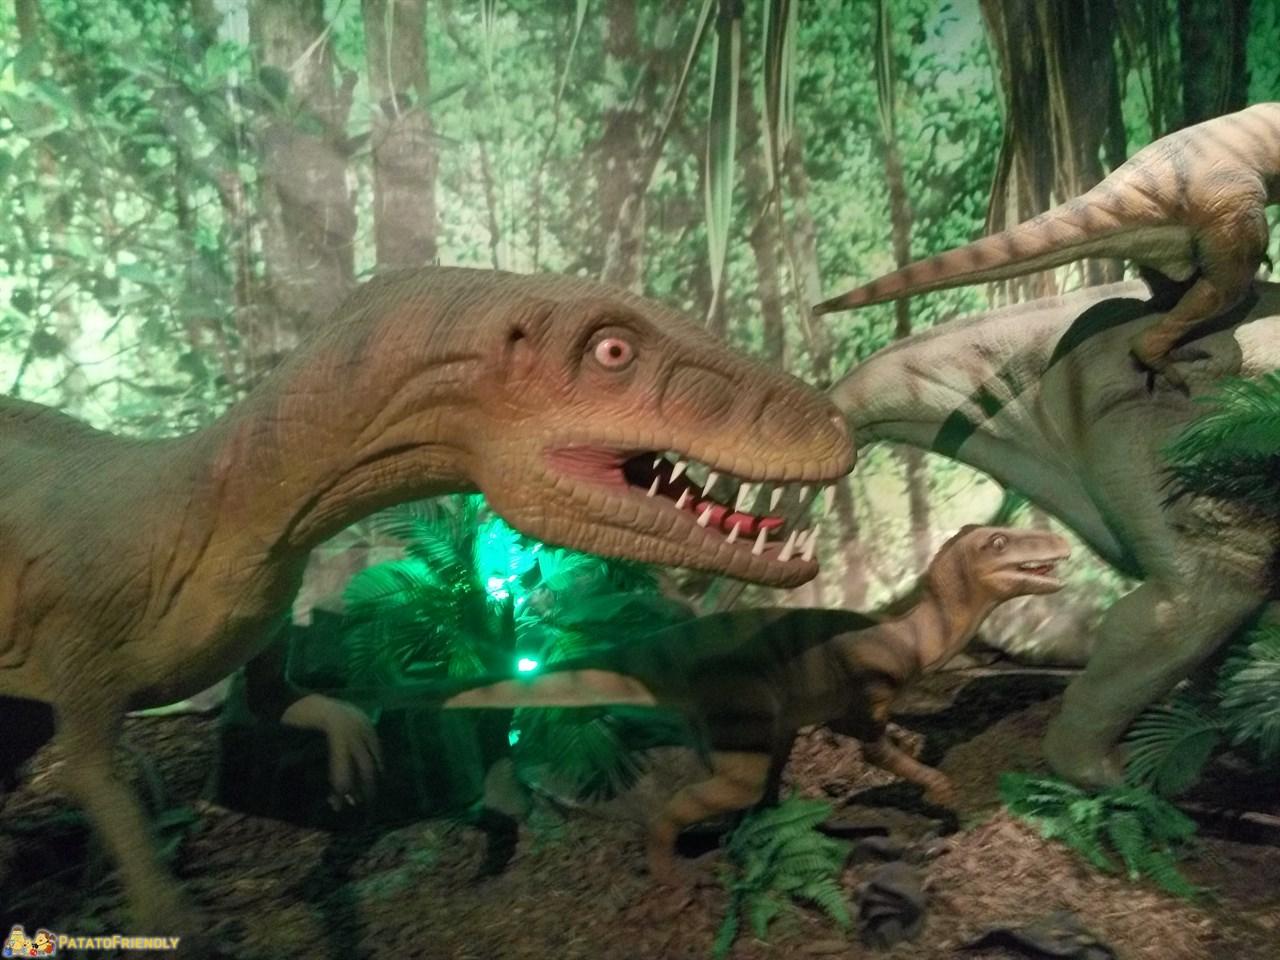 [cml_media_alt id='9543']Dinosaurs Live - La mostra dei dinosauri a Torino[/cml_media_alt]